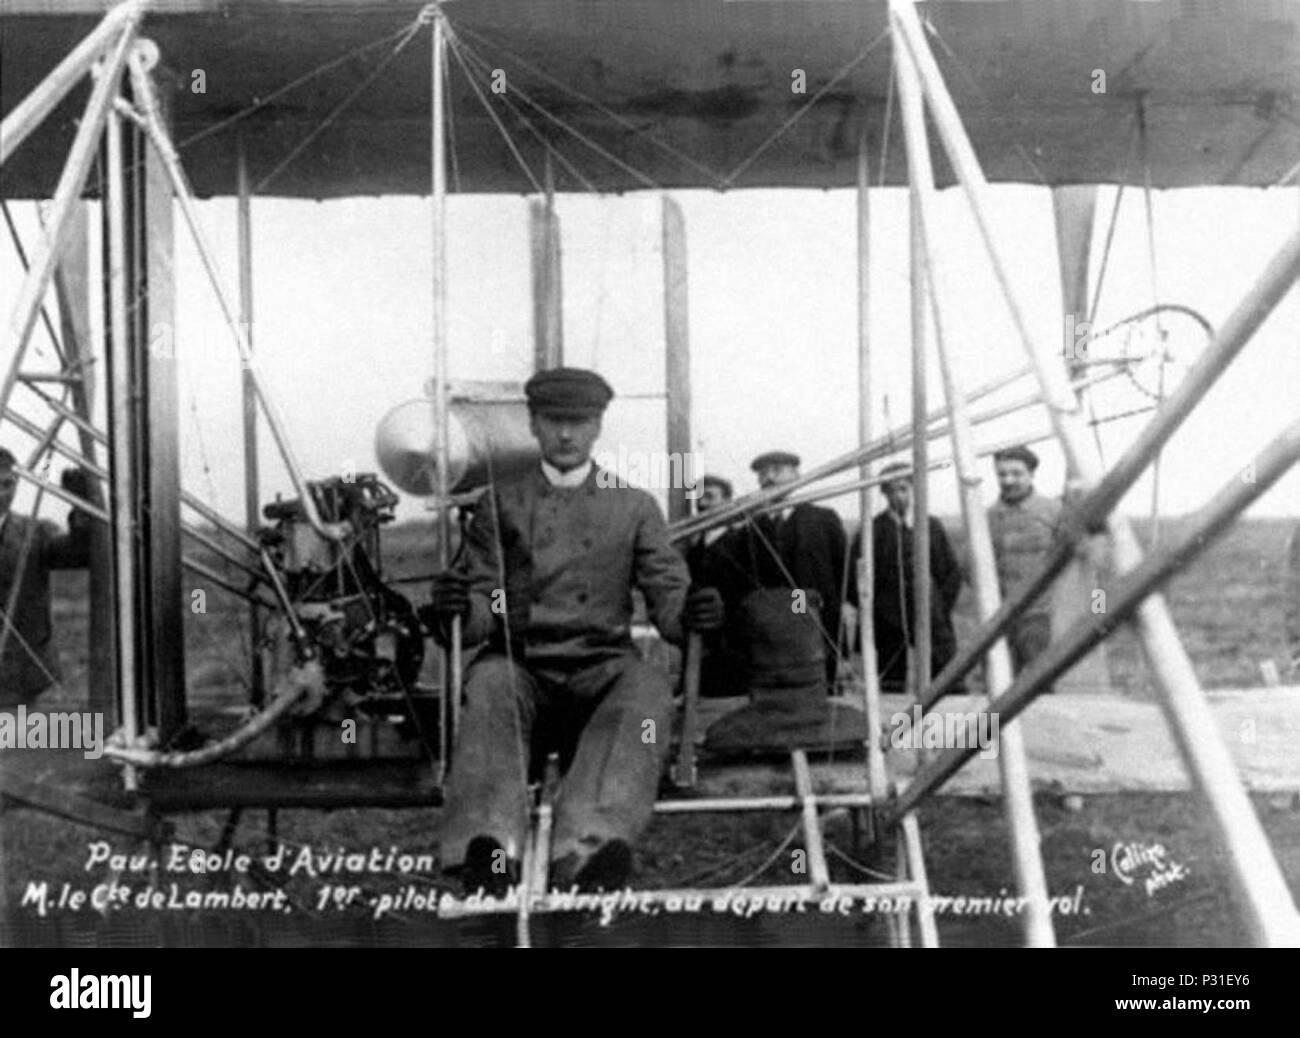 -Carlos Alexandre, conde de Lambert 1C2BA piloto do biplano Wrigth no seu primeiro voo - Pau, 1908 Stock Photo